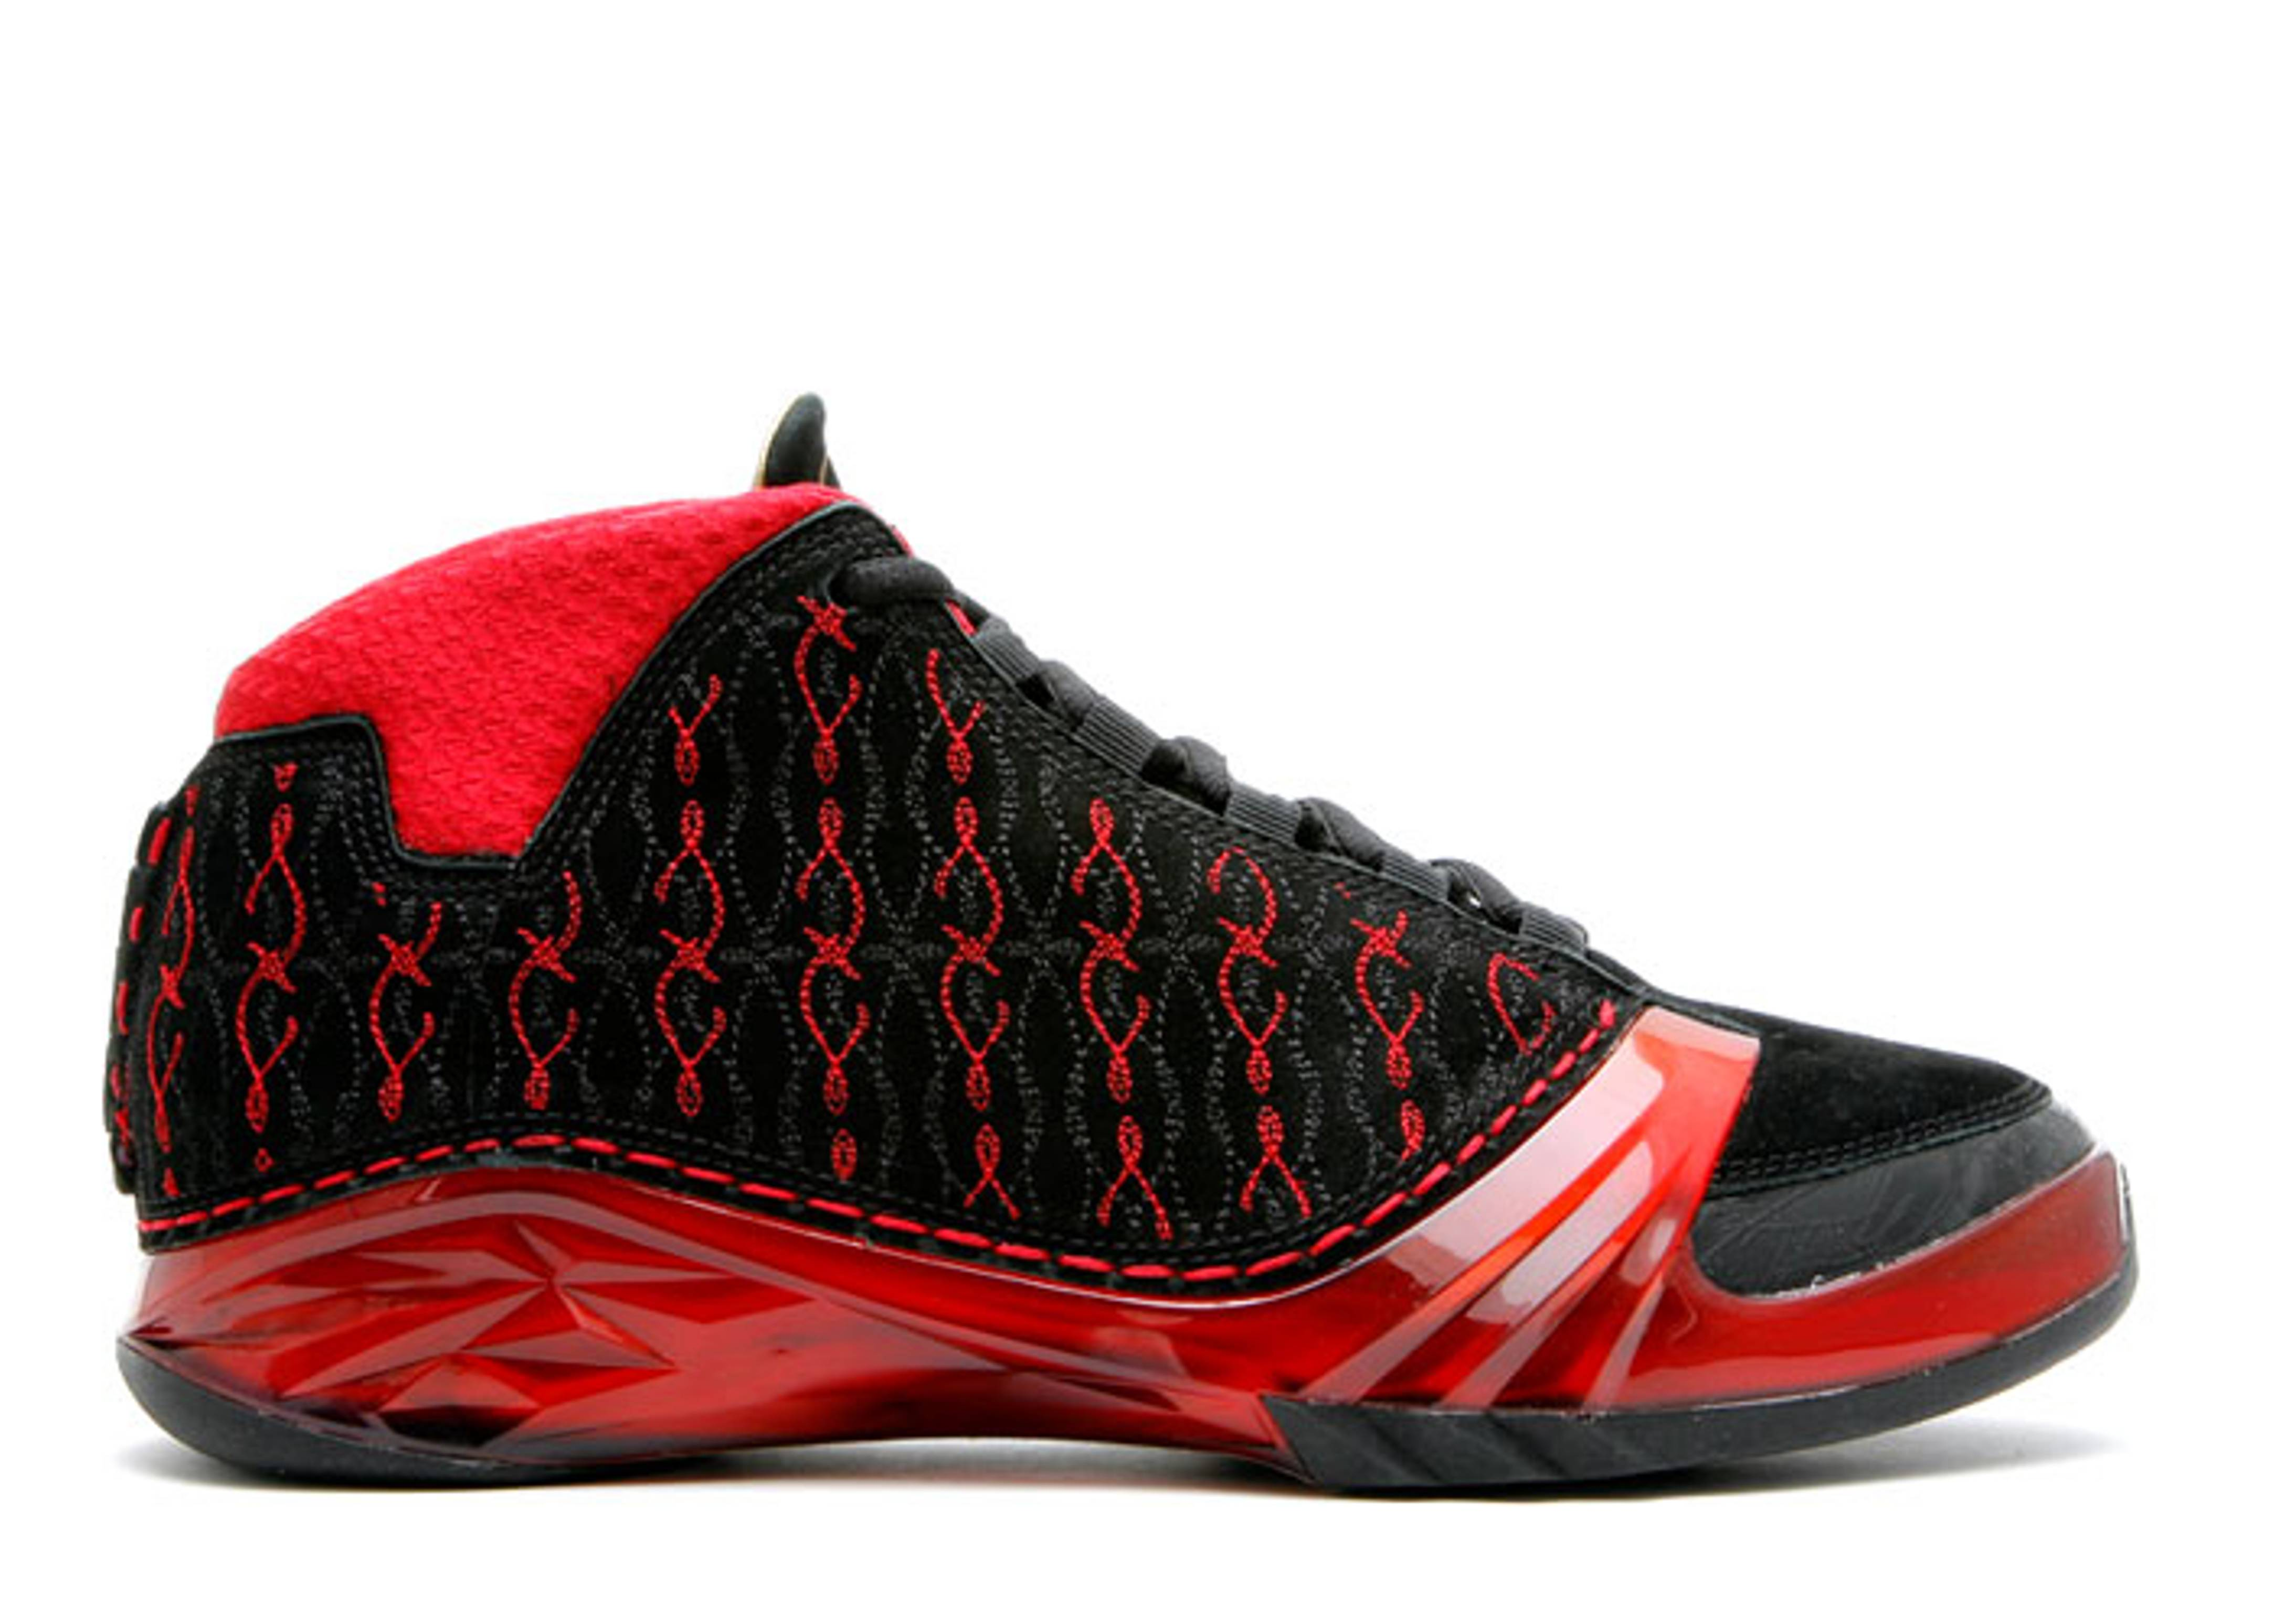 368d381d459 Air Jordan 23 (XXIII) Shoes - Nike | Flight Club